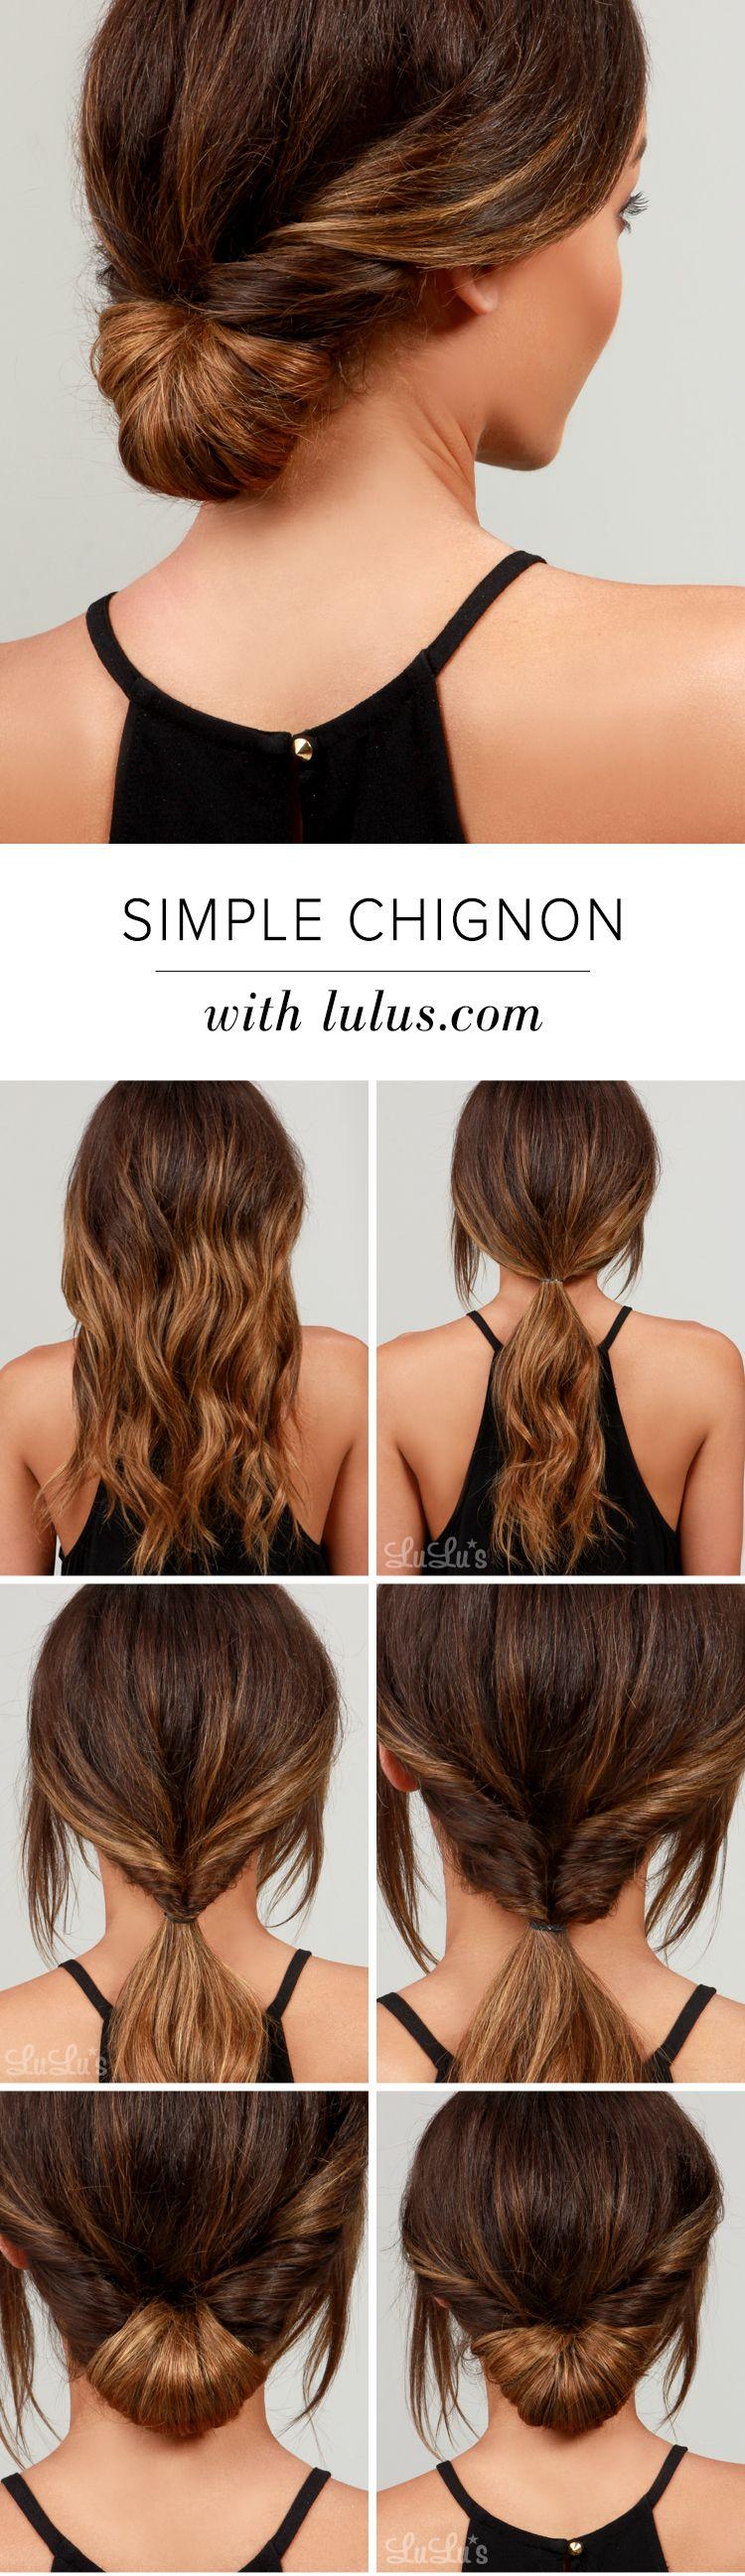 Lulus How To Simple Chignon Hair Tutorial Lulus Com Fashion Blog Hair Styles Chignon Hair Long Hair Styles